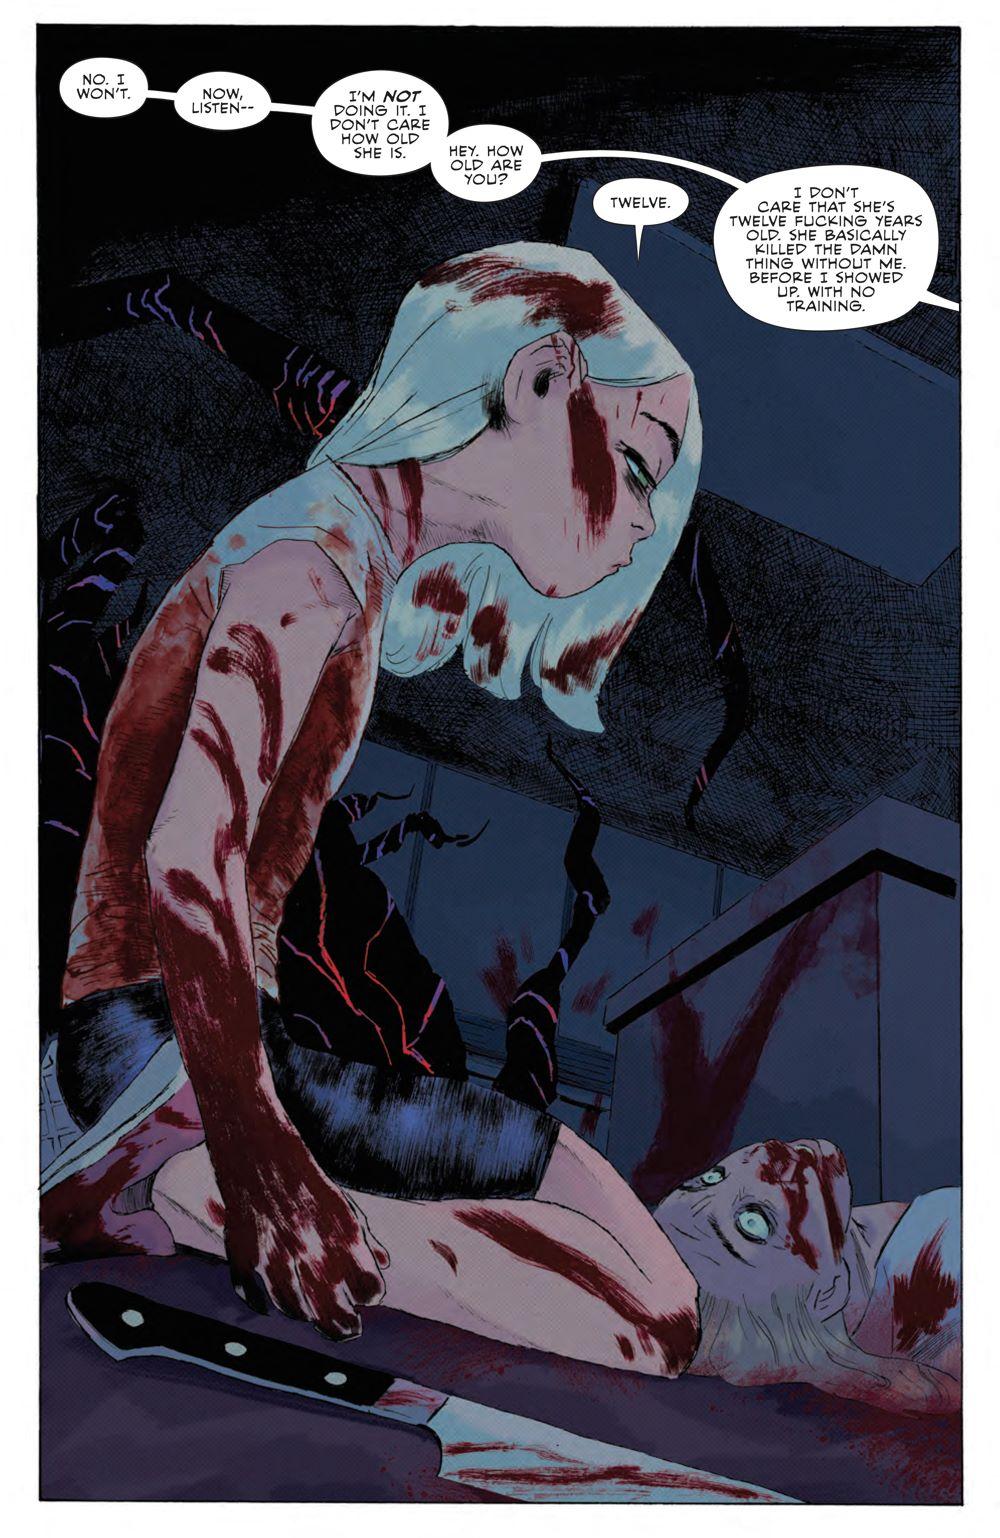 SomethingKillingChildren_016_PRESS_2 ComicList Previews: SOMETHING IS KILLING THE CHILDREN #16